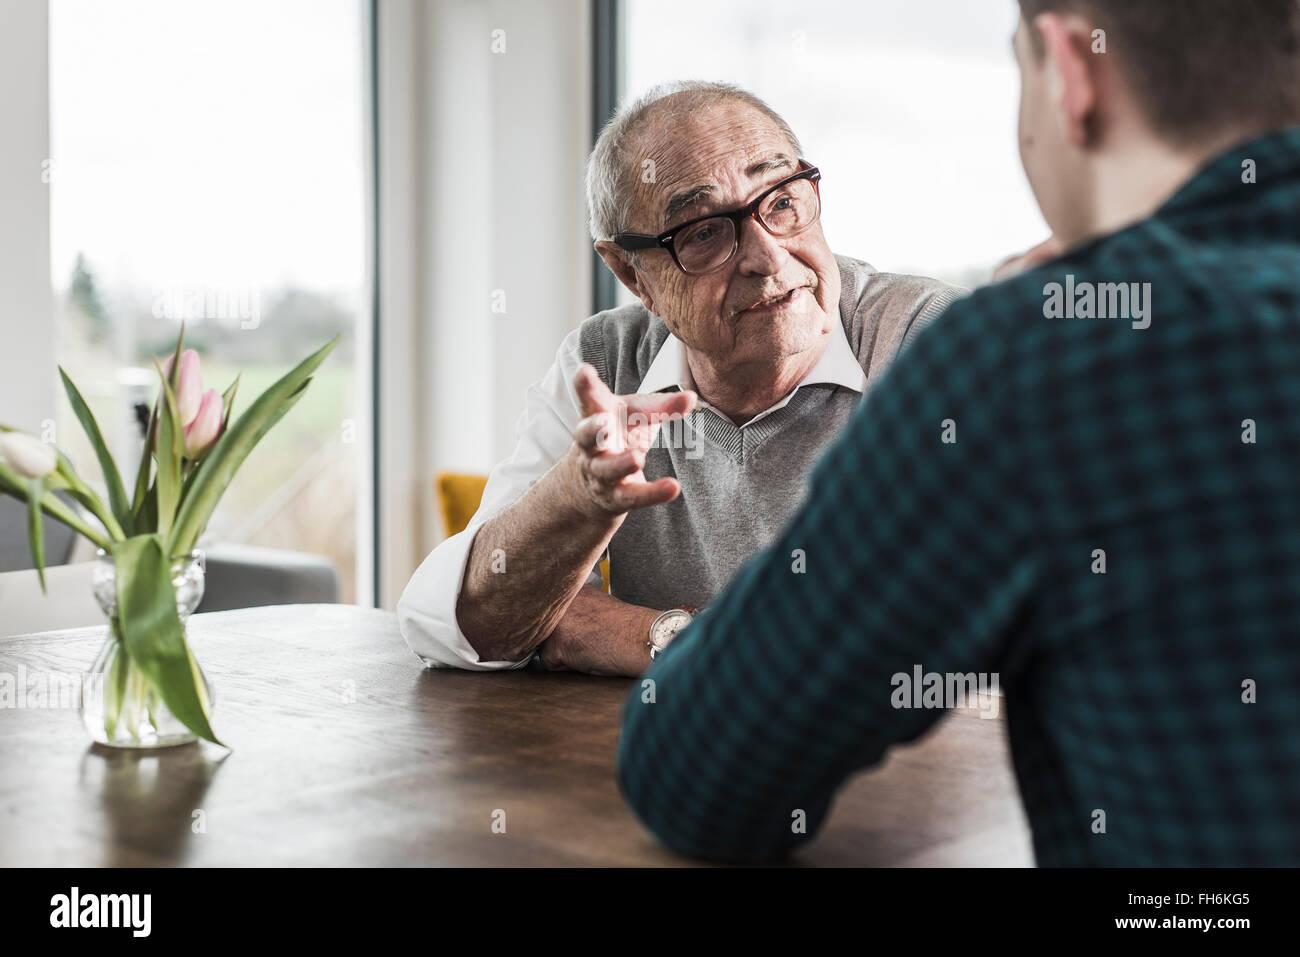 Portrait of senior man communicating with his grandson - Stock Image